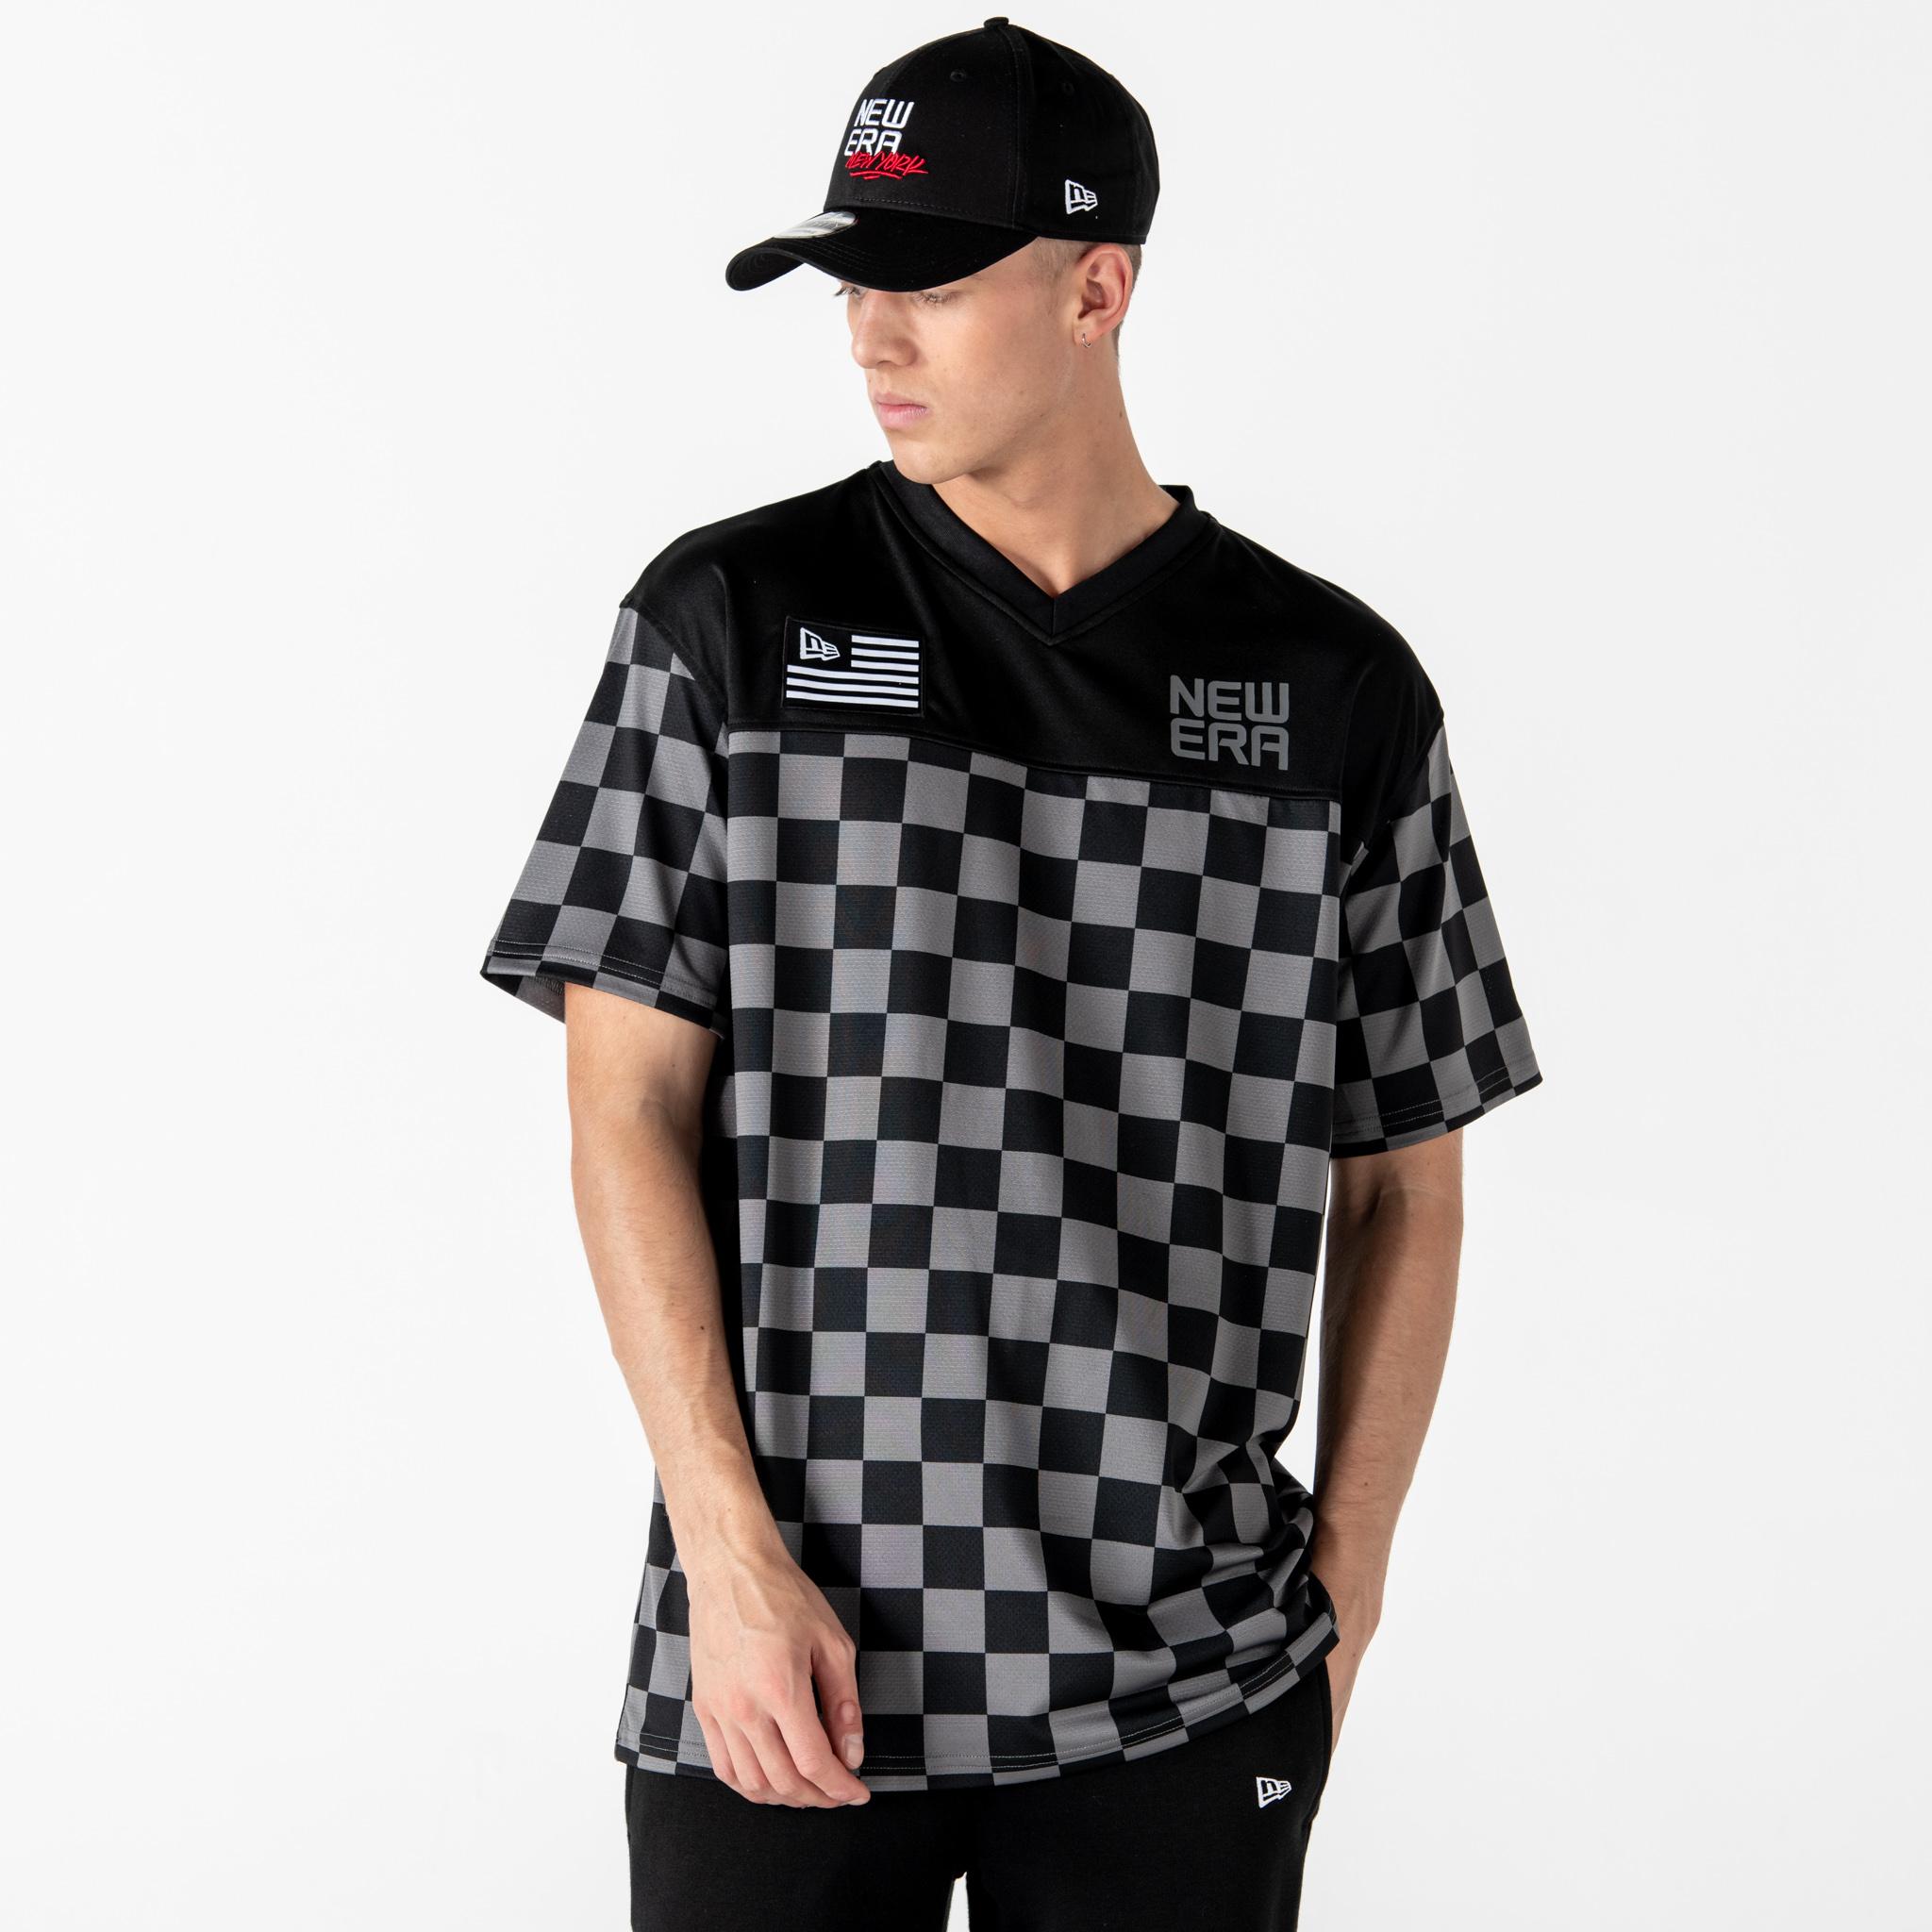 Camiseta New Era extragrande a cuadros, negro